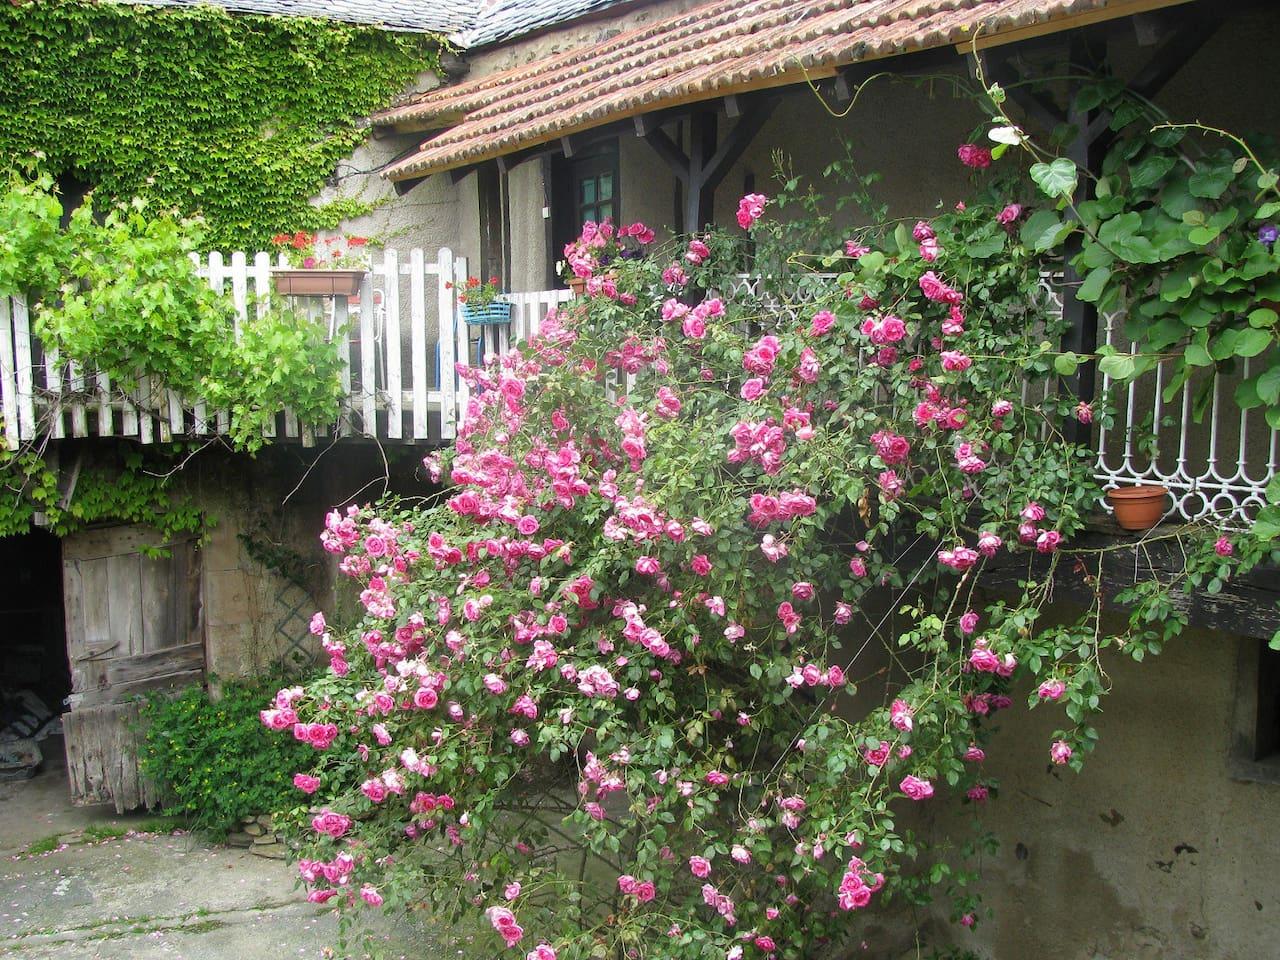 The rose strewn balcony